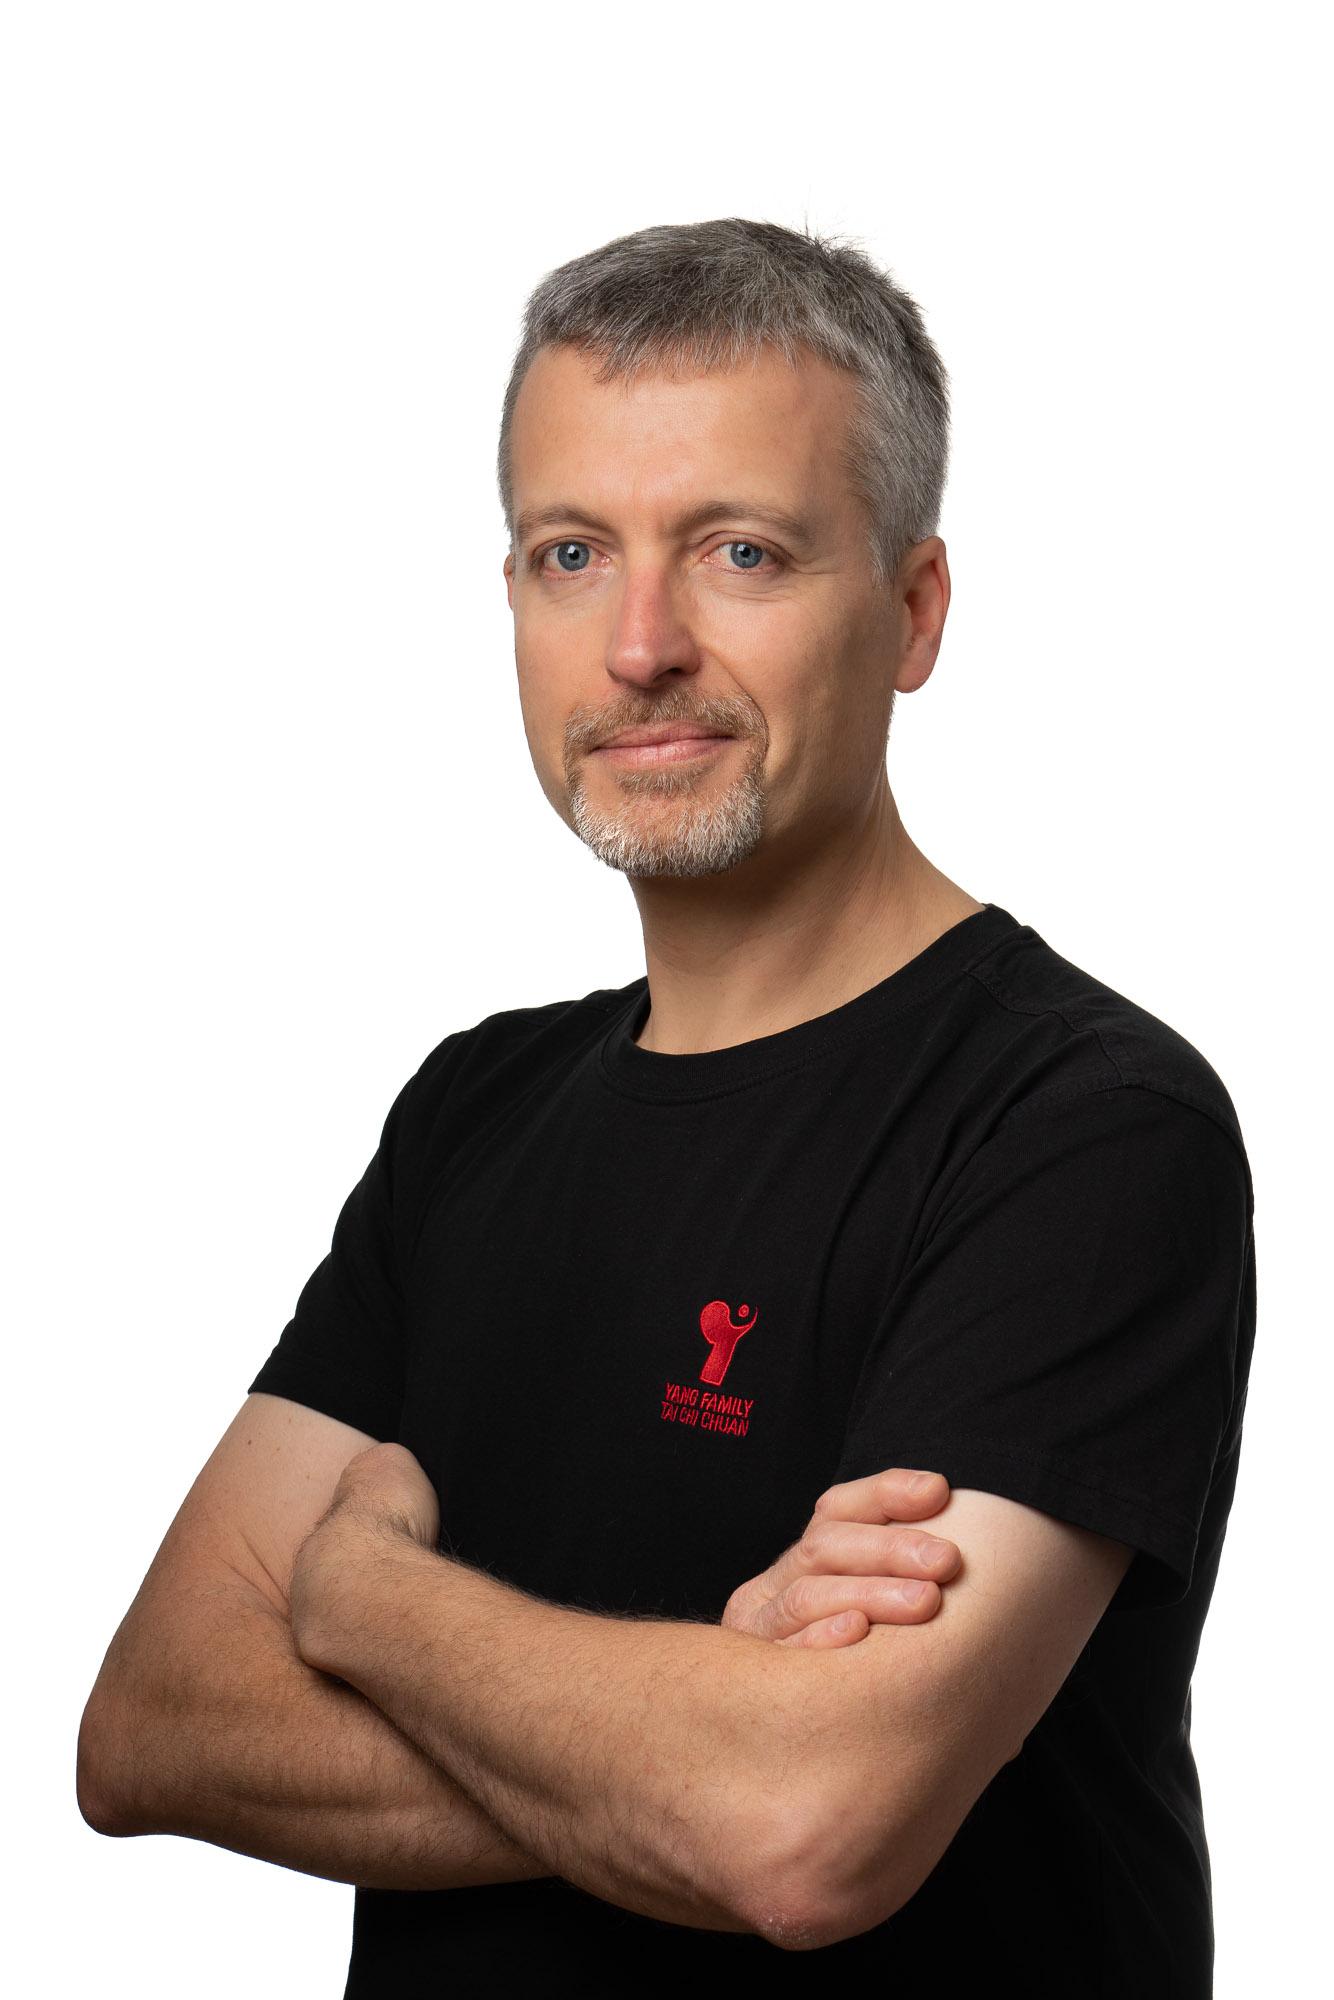 Robert Irrausch, 杨雅谨 (Yang Yajin)